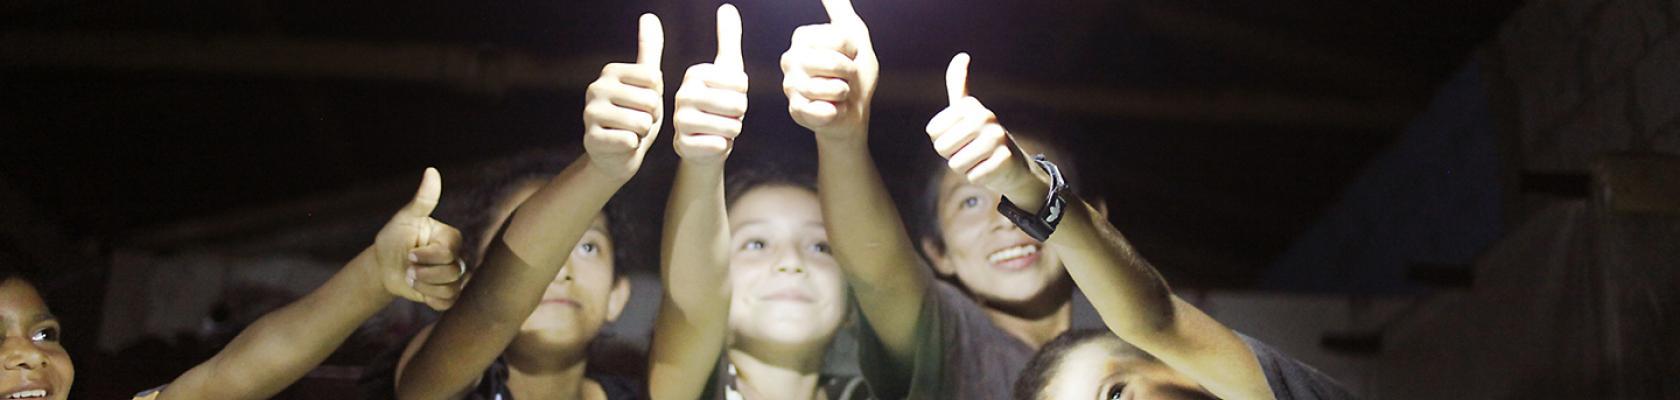 Guatemala, énergie, Kingo, enfants